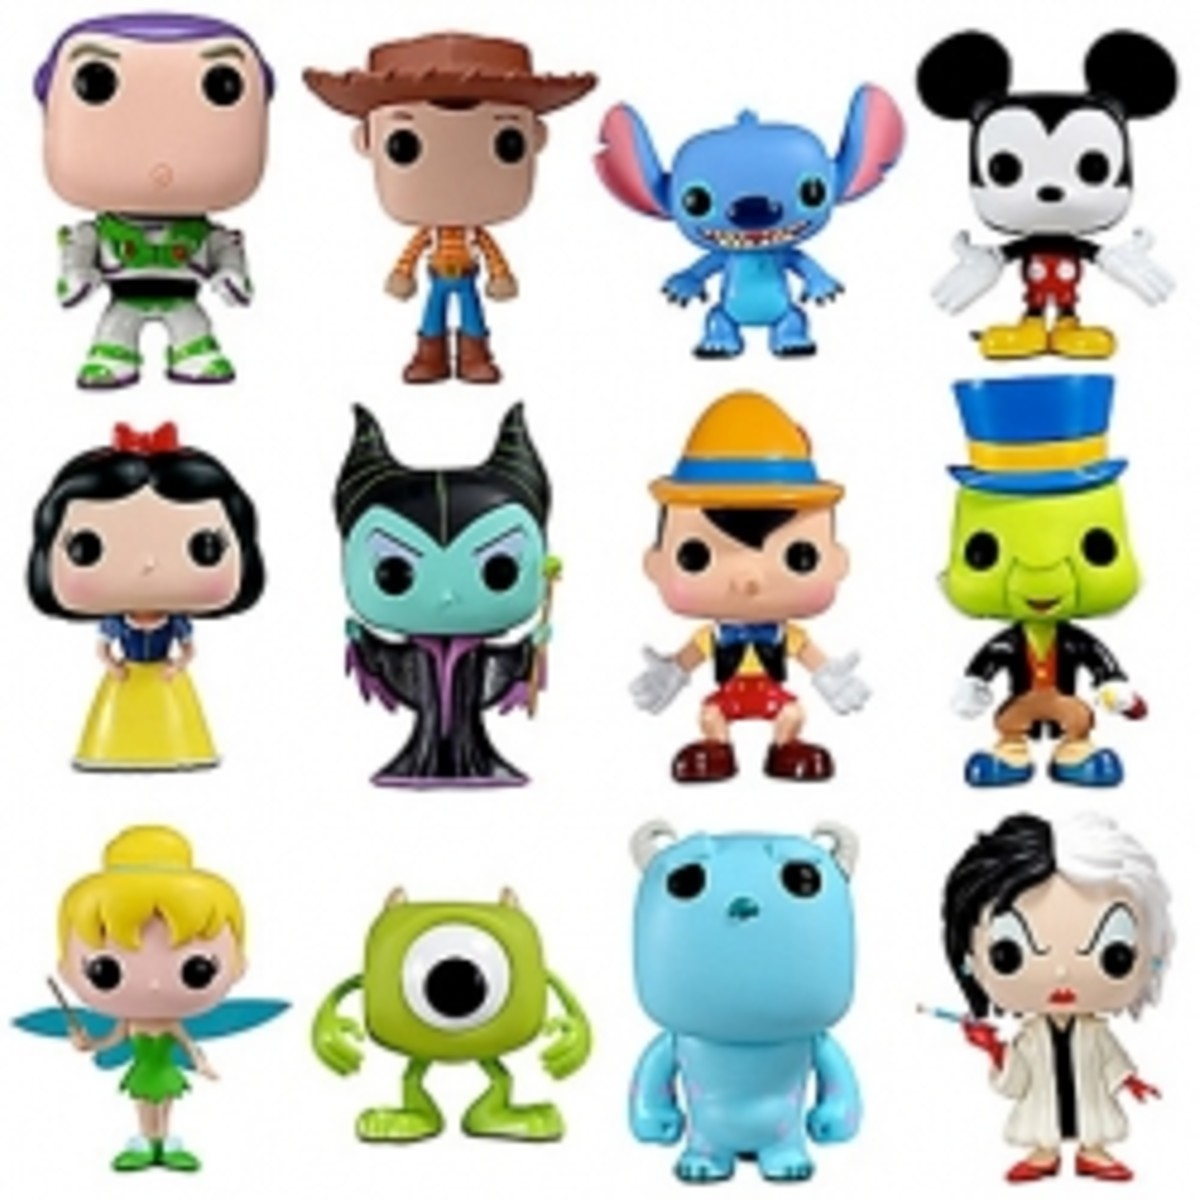 Set of Disney Pop Series 1